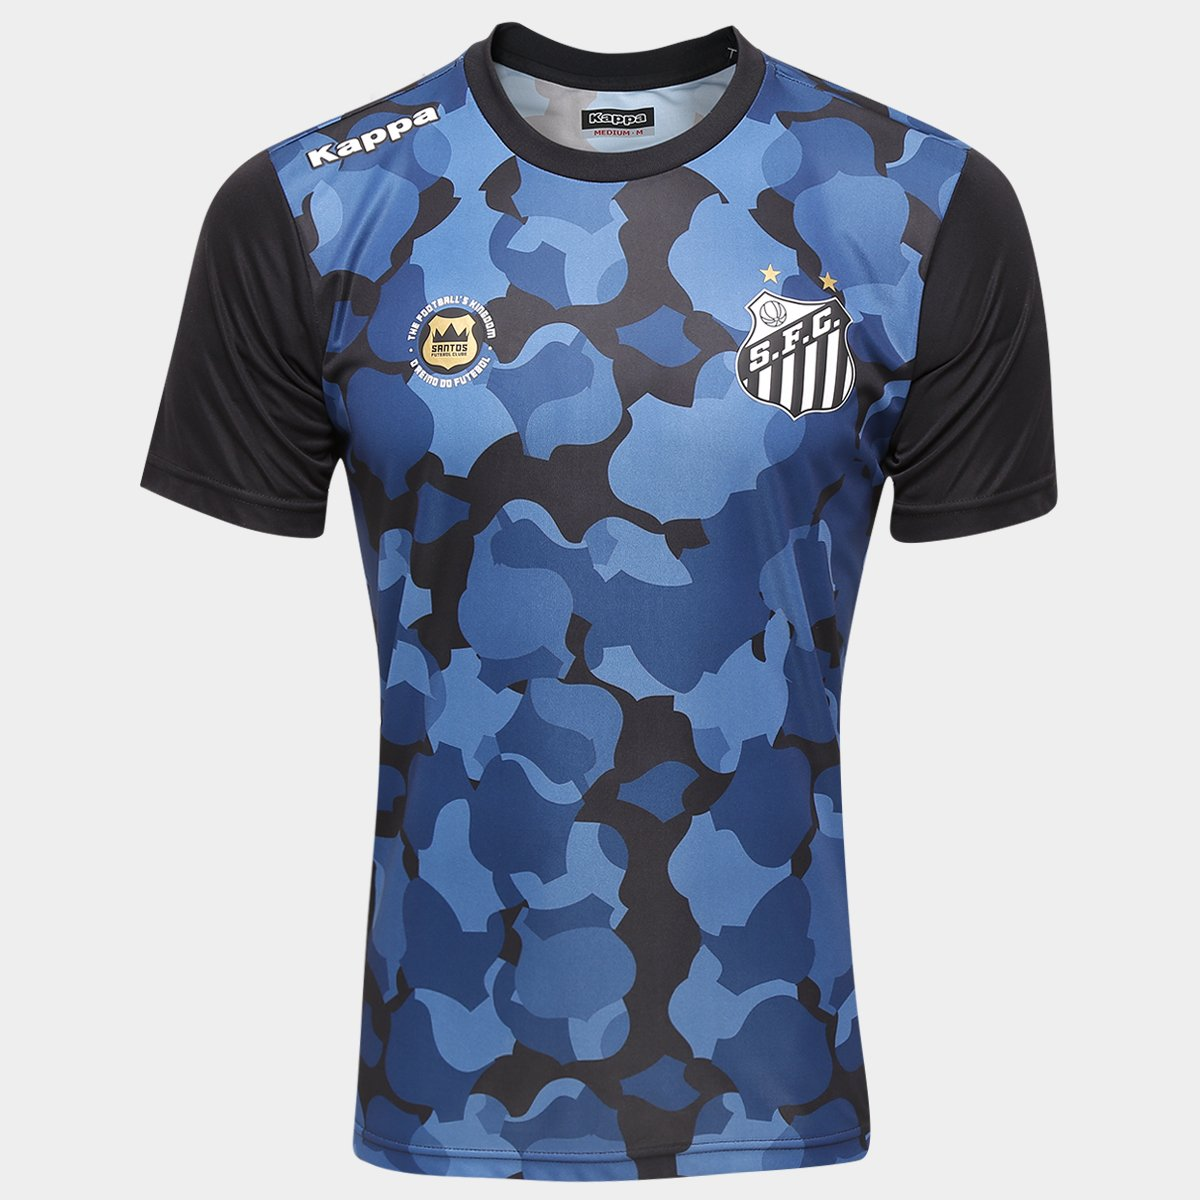 aa060c26d3 Camisa de Treino Santos Pre Match 2016 Kappa Masculina - Compre Agora